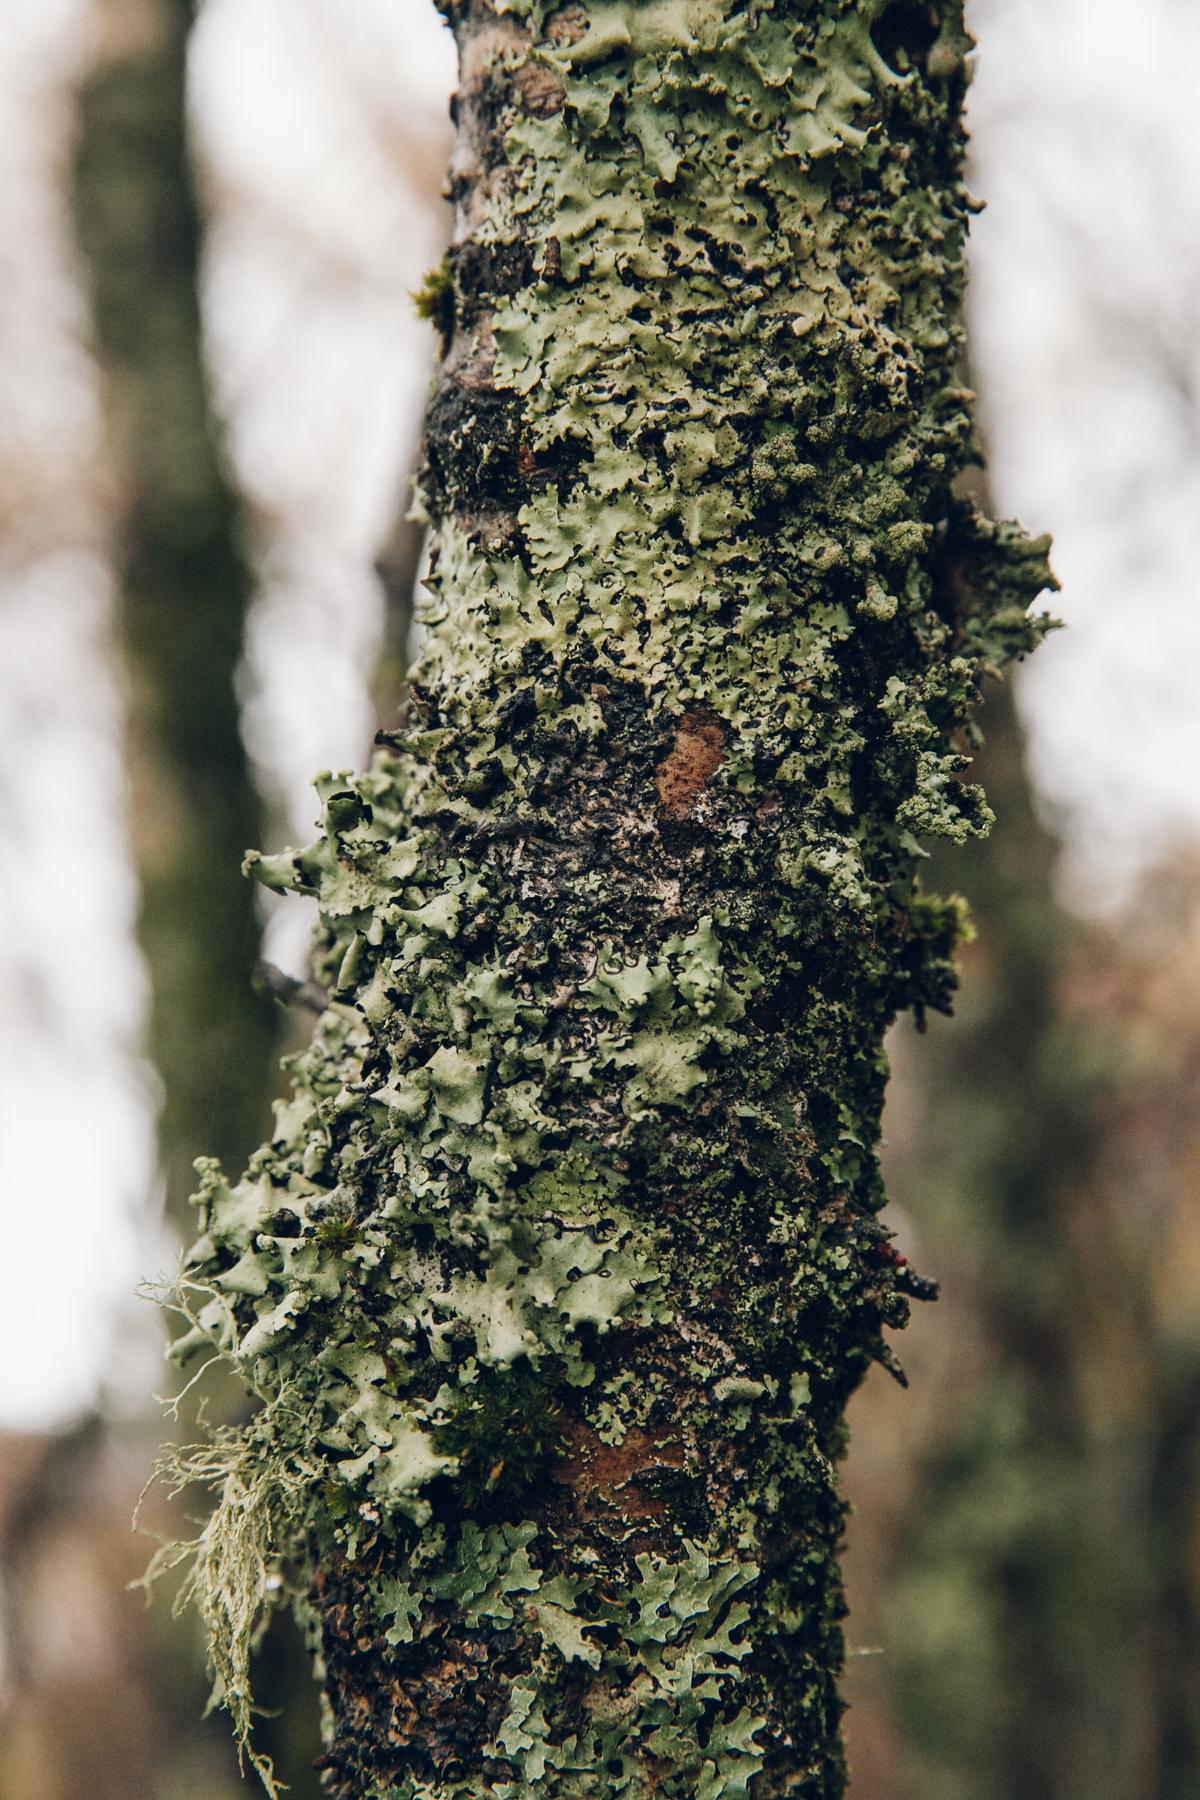 Lichen on a tree trunk.